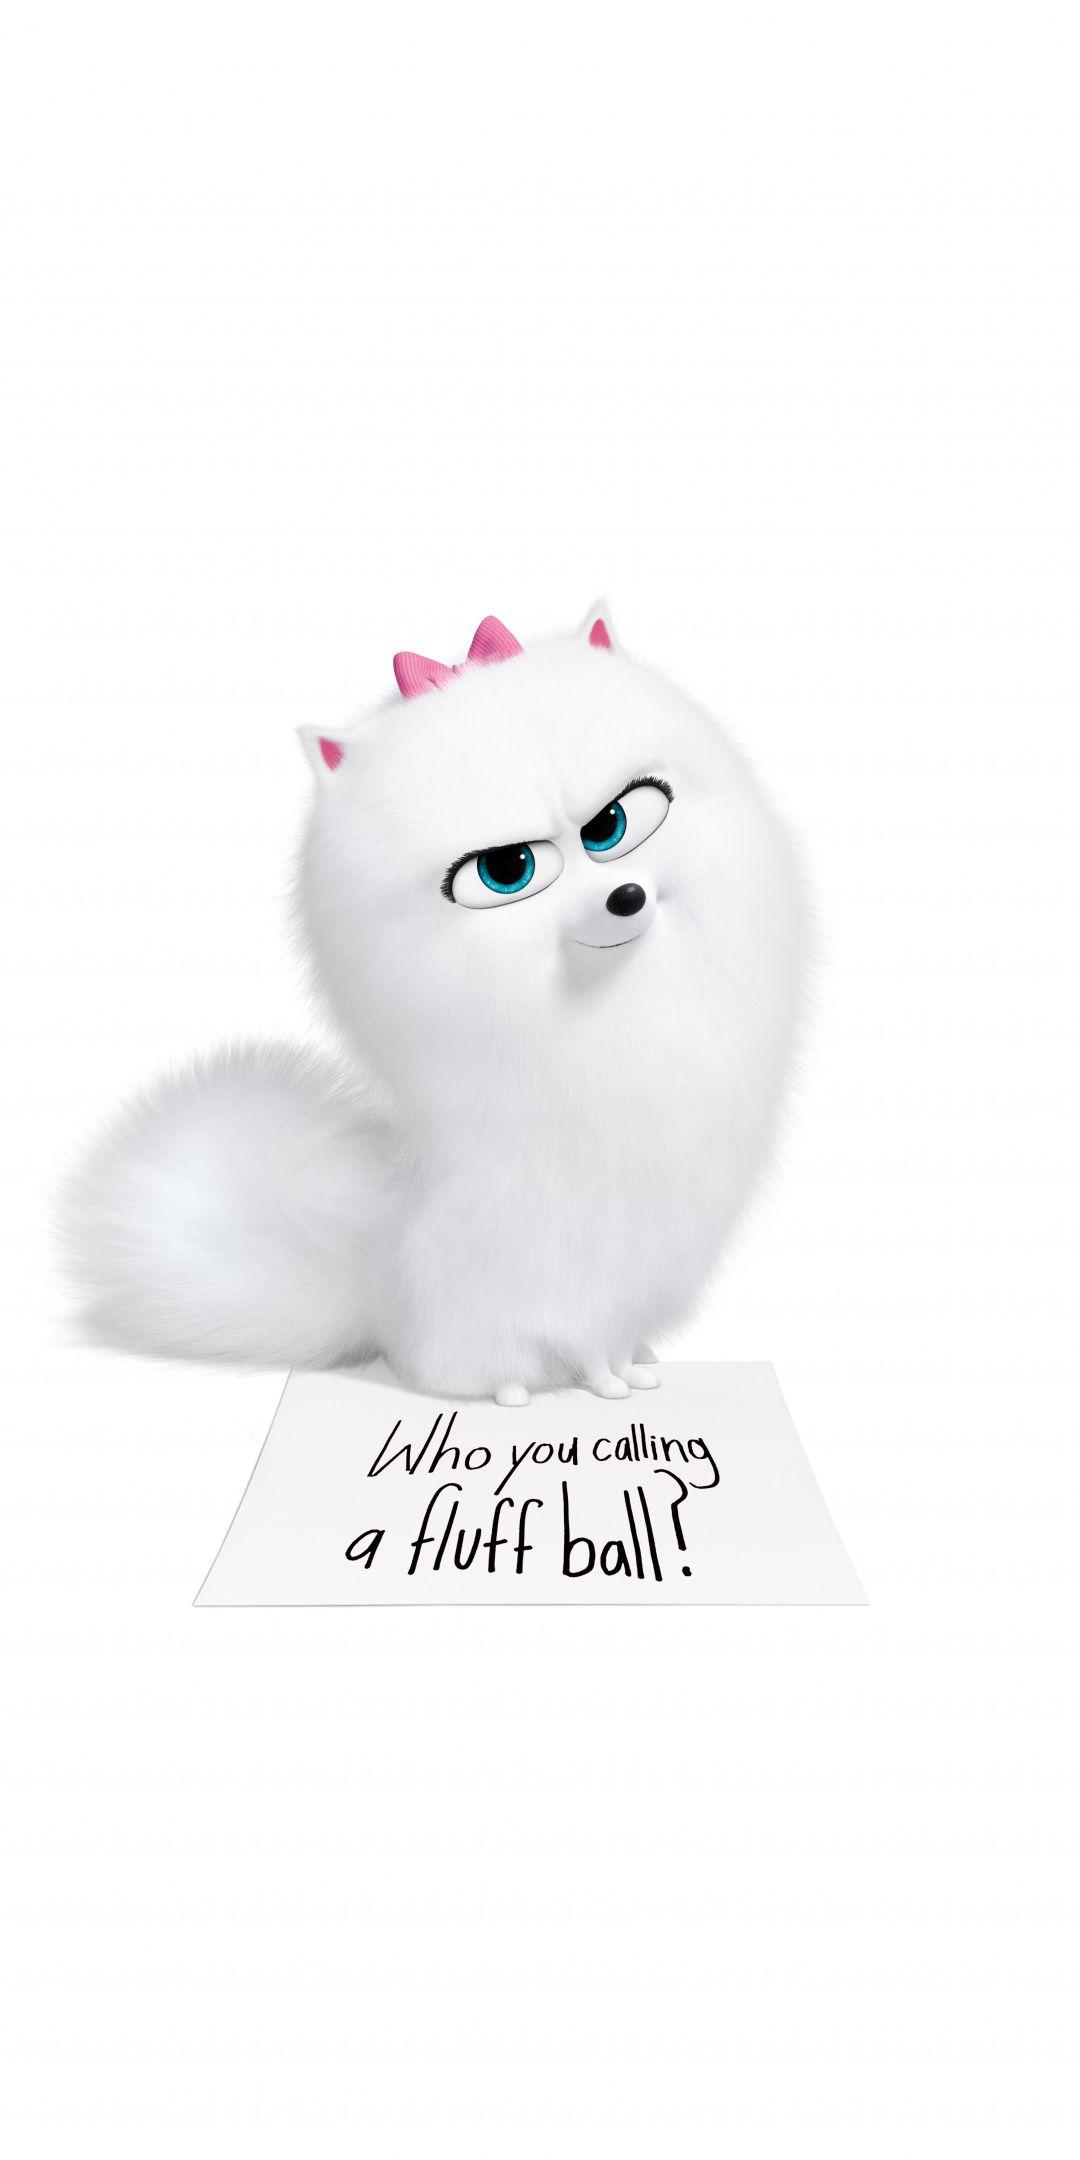 The Secret Life Of Pets 2 Gidget Cute Dog 2019 1080x2160 Wallpaper Cute Dog Cartoon Secret Life Of Pets Pets Movie